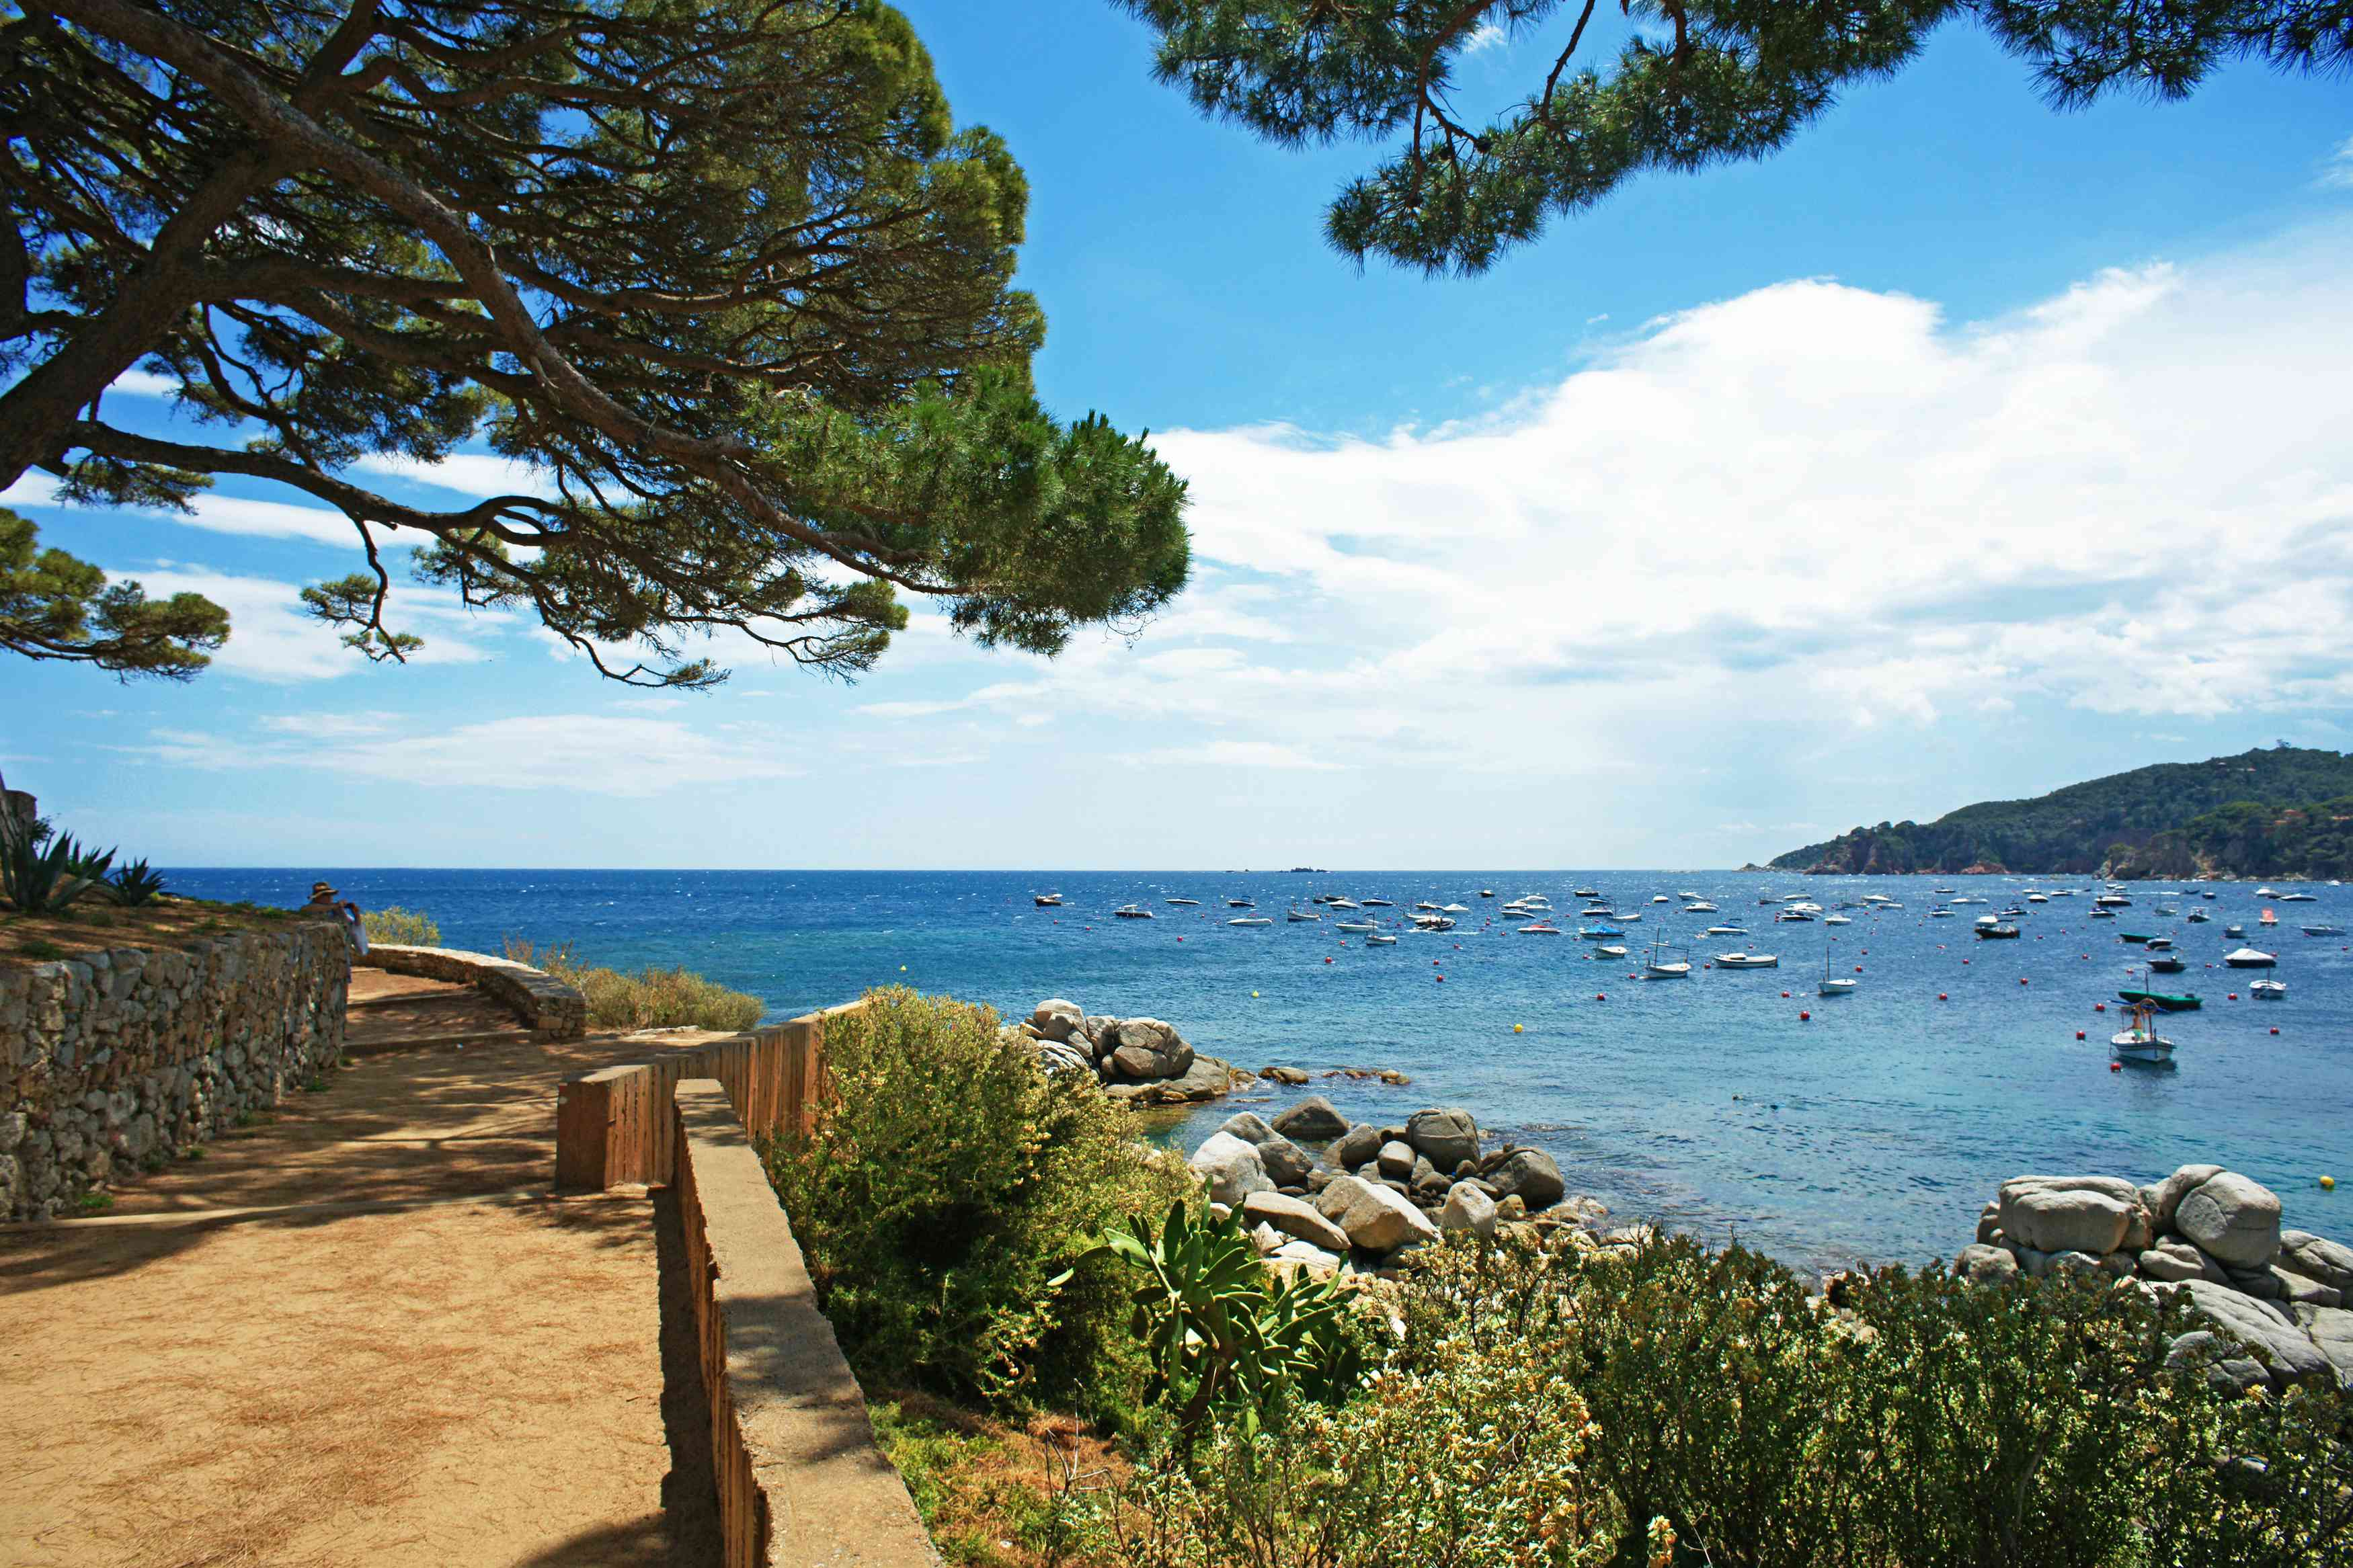 Views of the Costa Brava